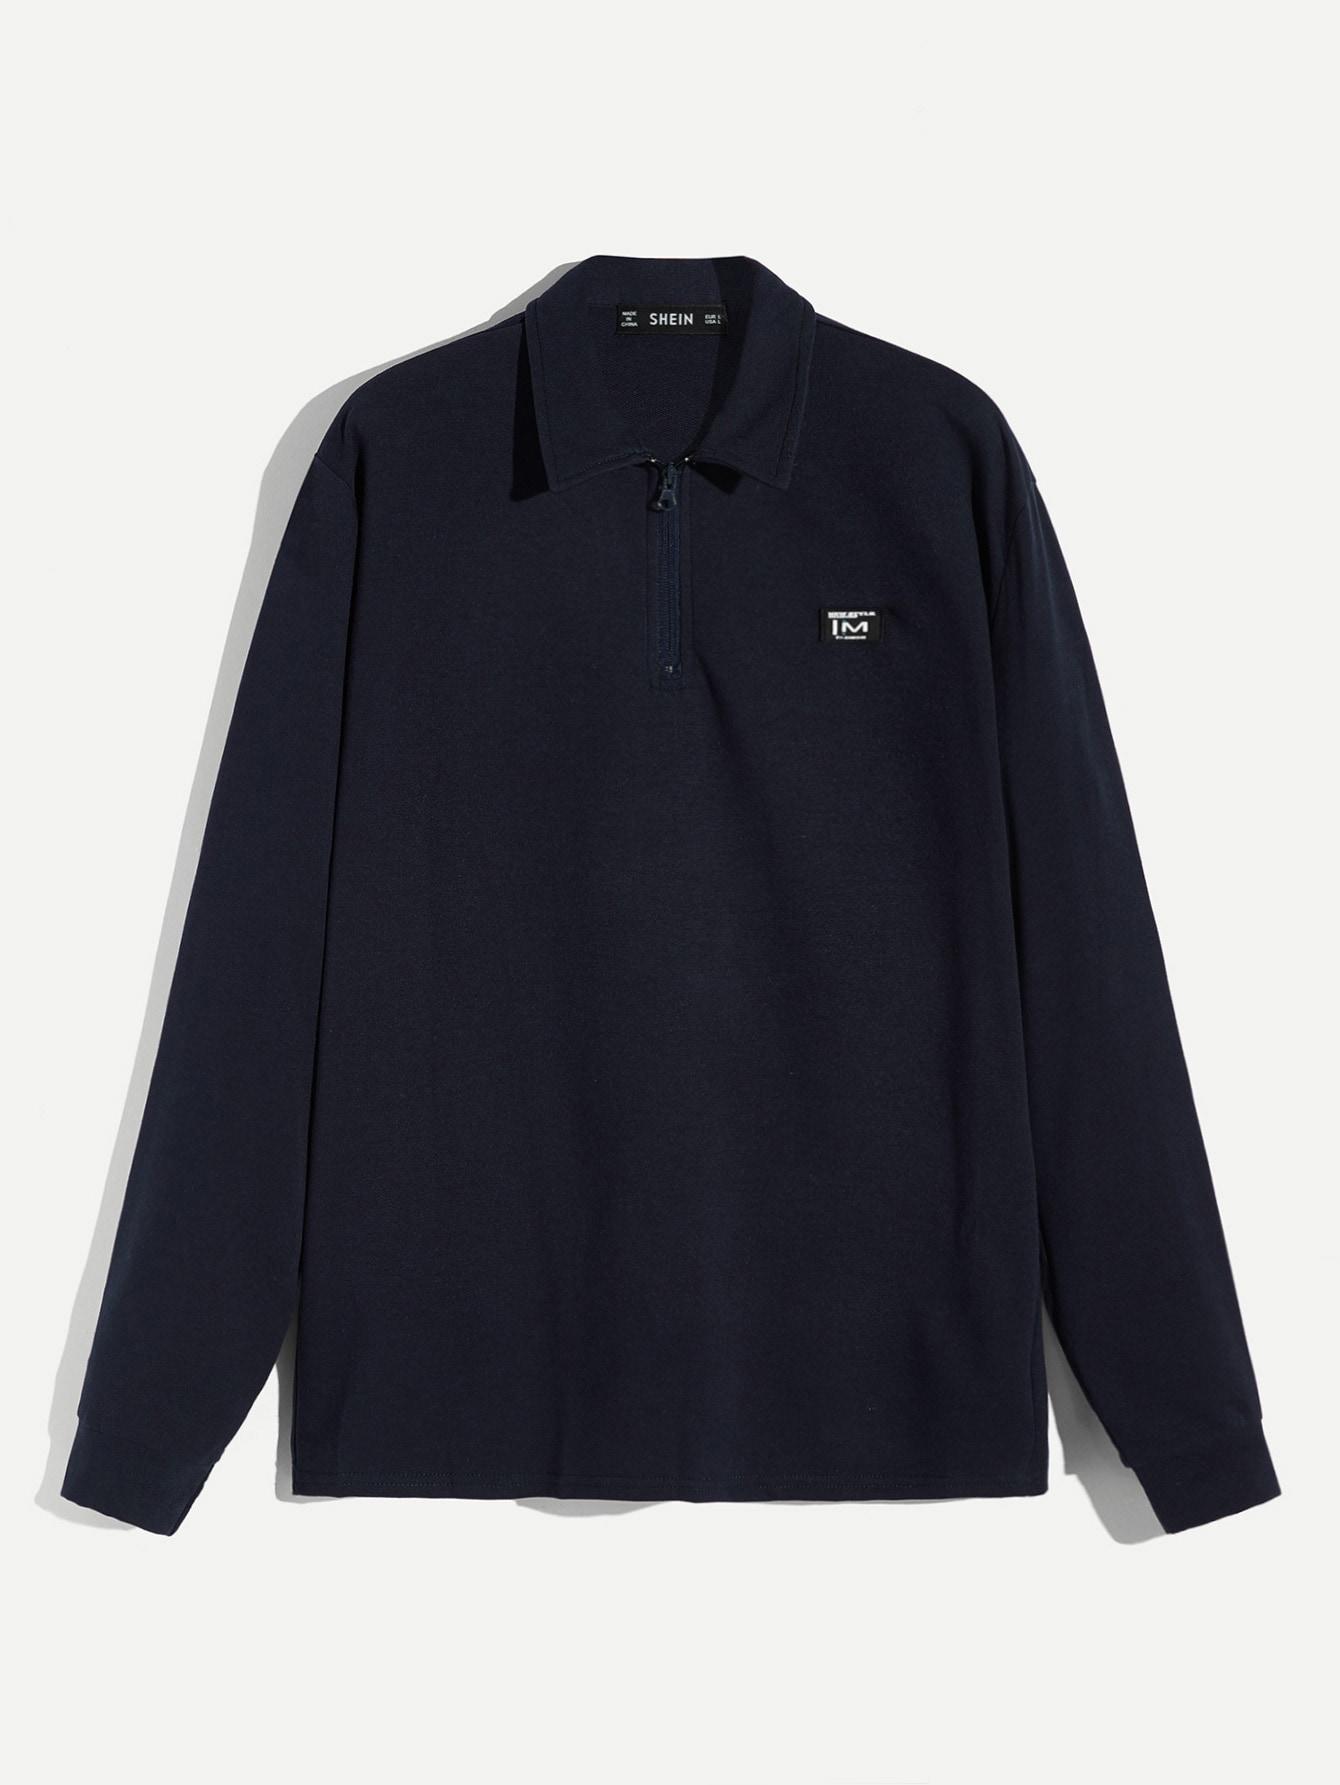 c1297cdd21 Men Zip Half Placket Striped Cuff Polo Shirt -SHEIN(SHEINSIDE)